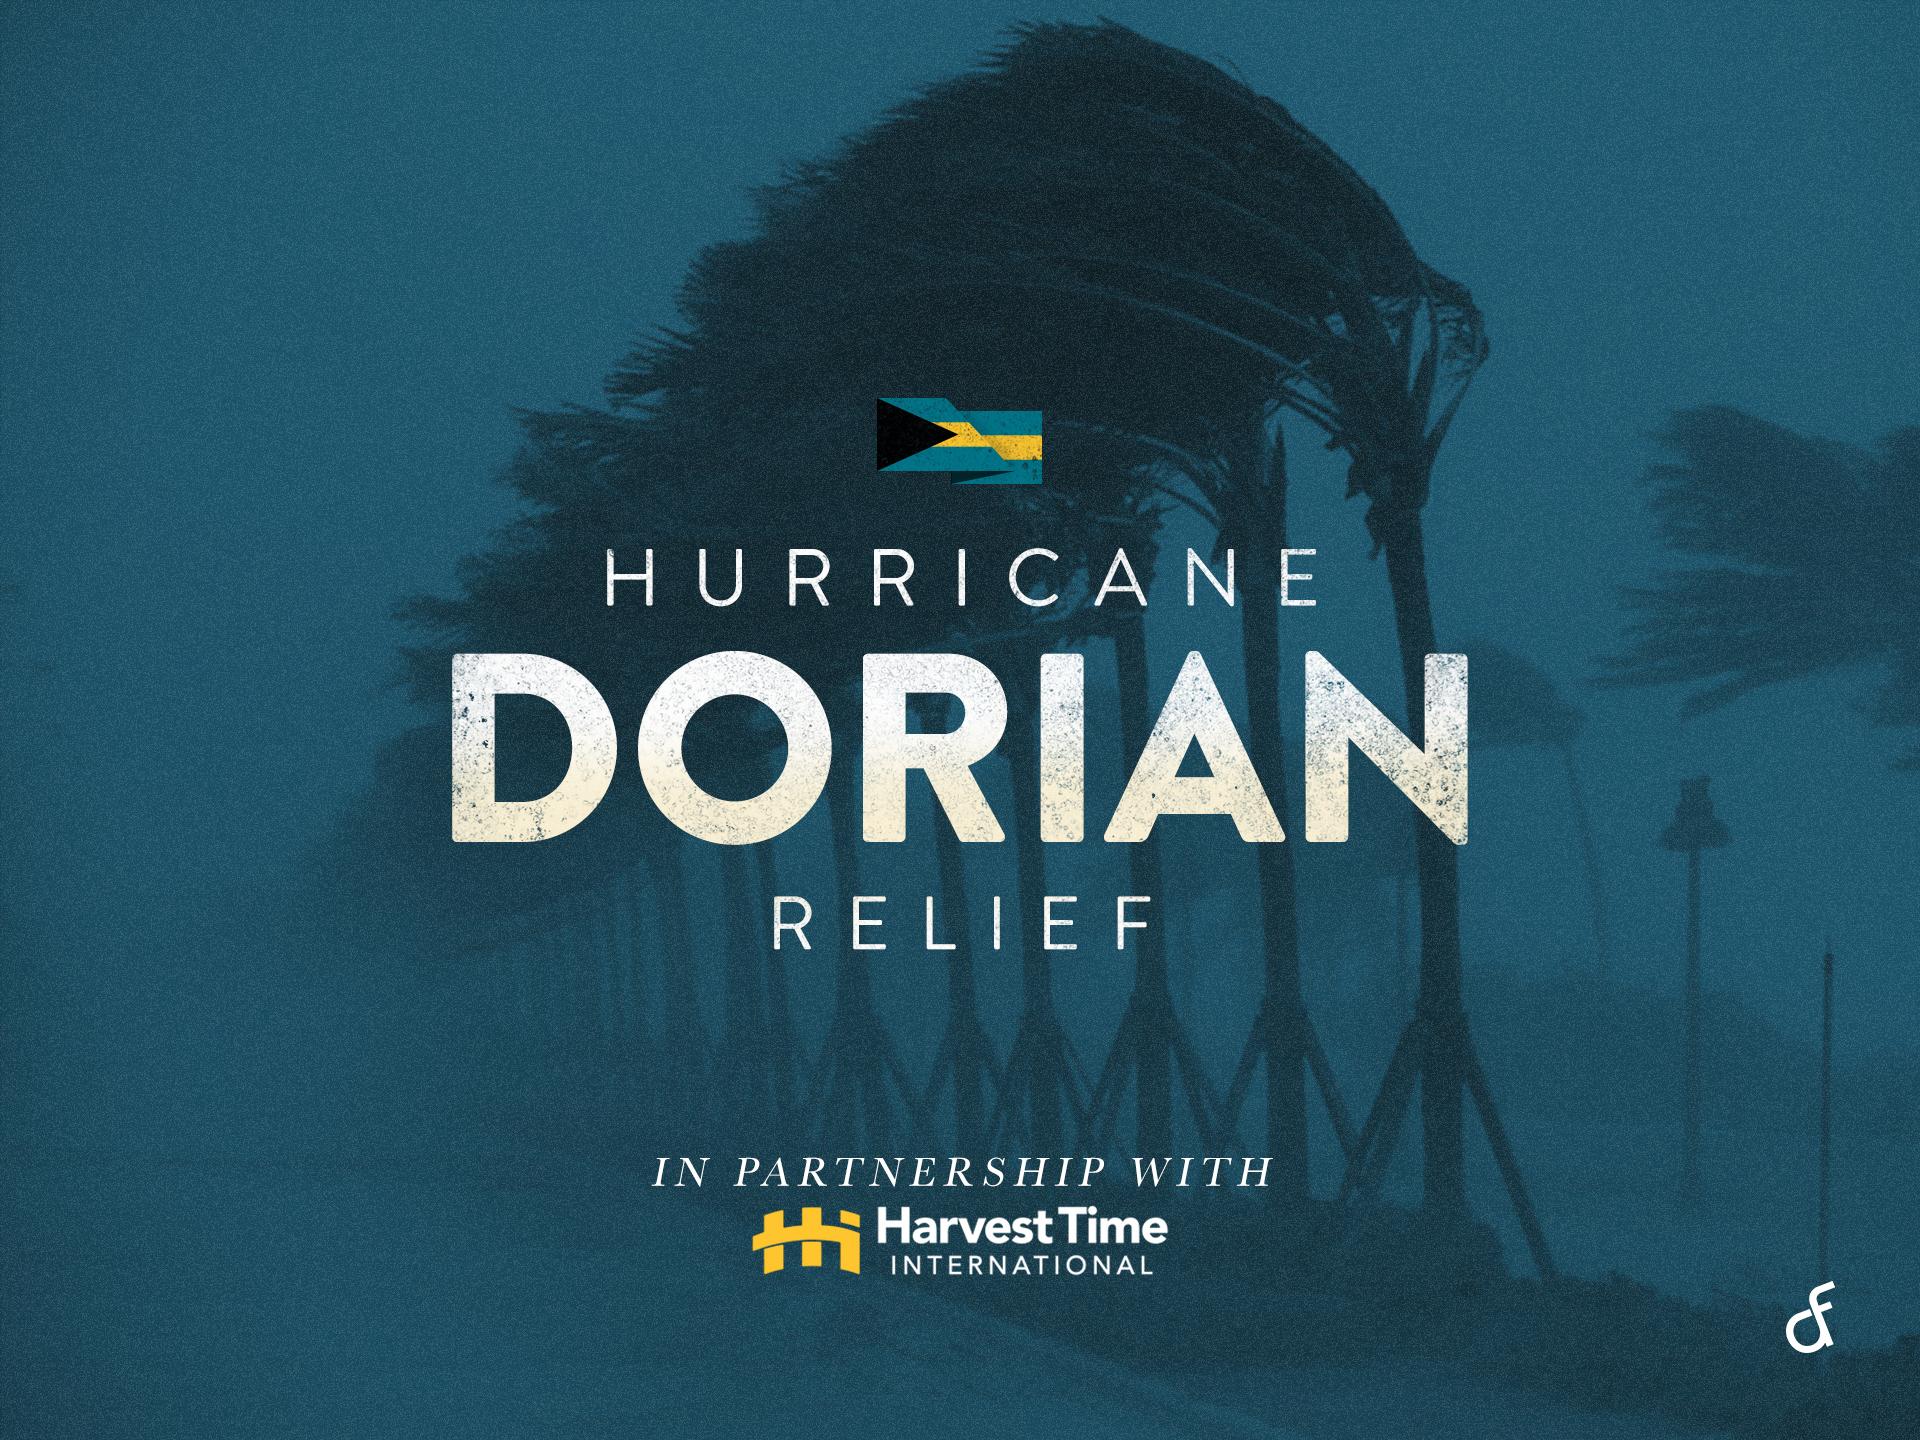 hurricane dorian relief.jpg